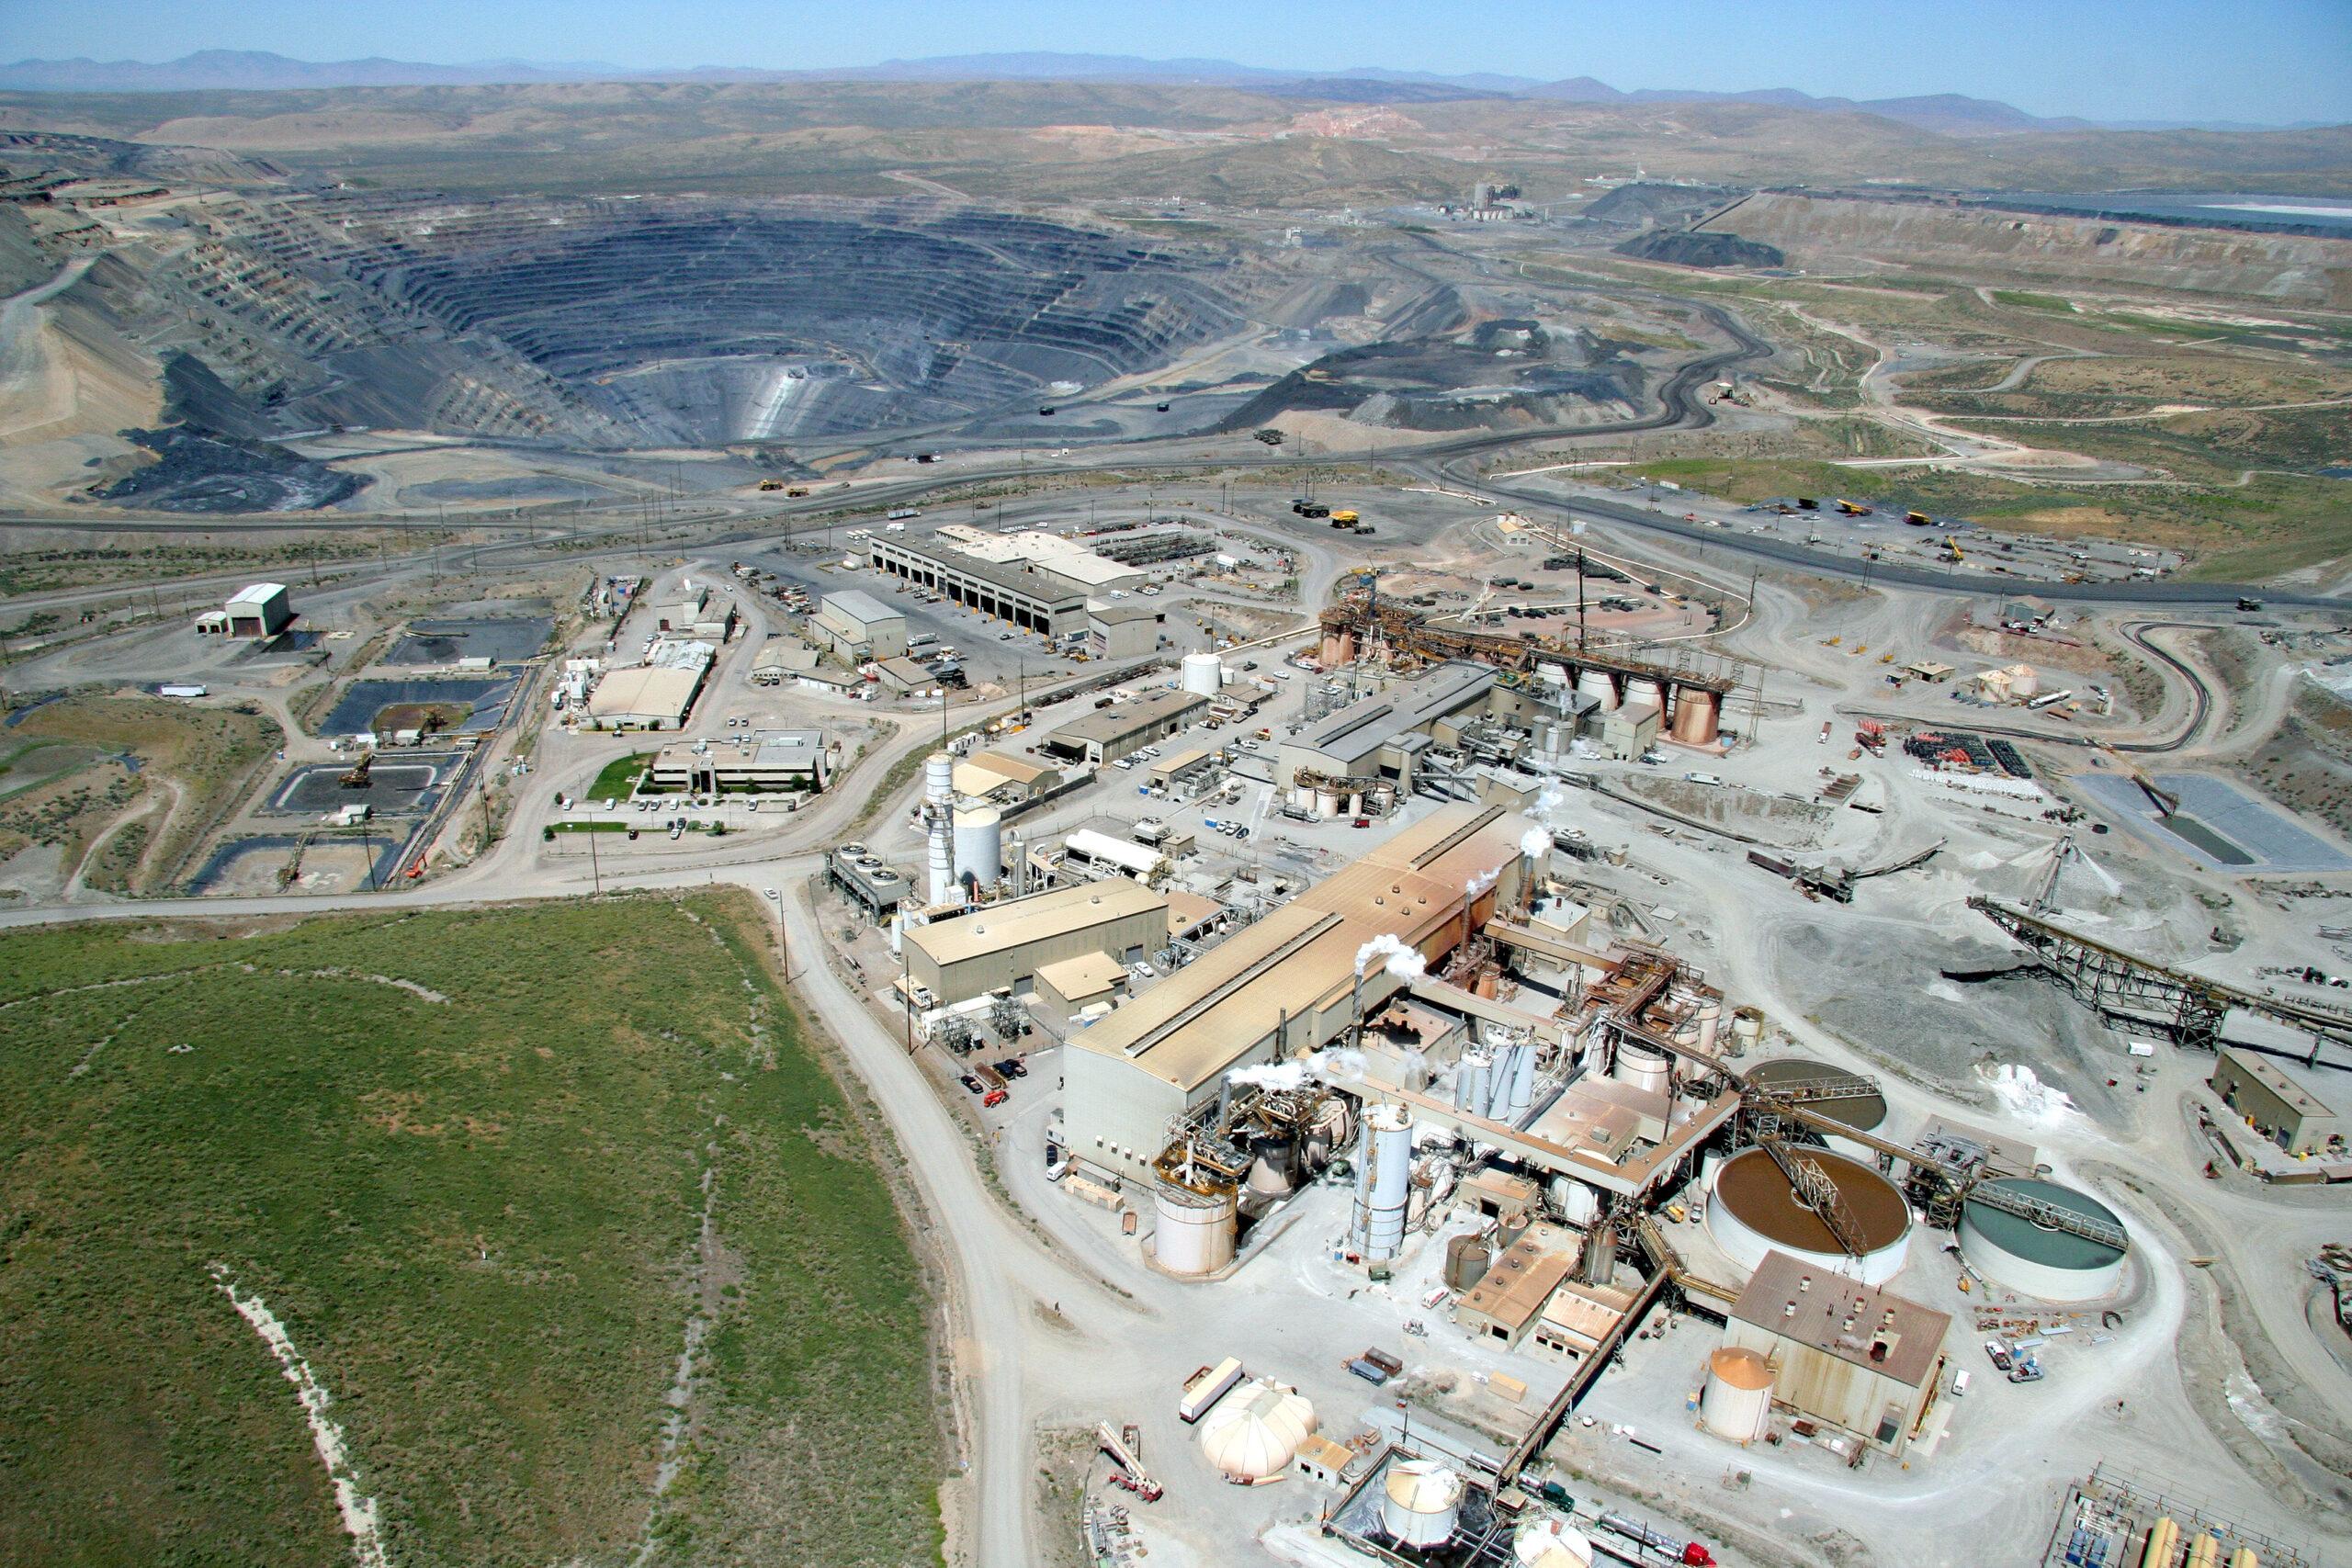 An overhead view of Barrick's Goldstrike Mine